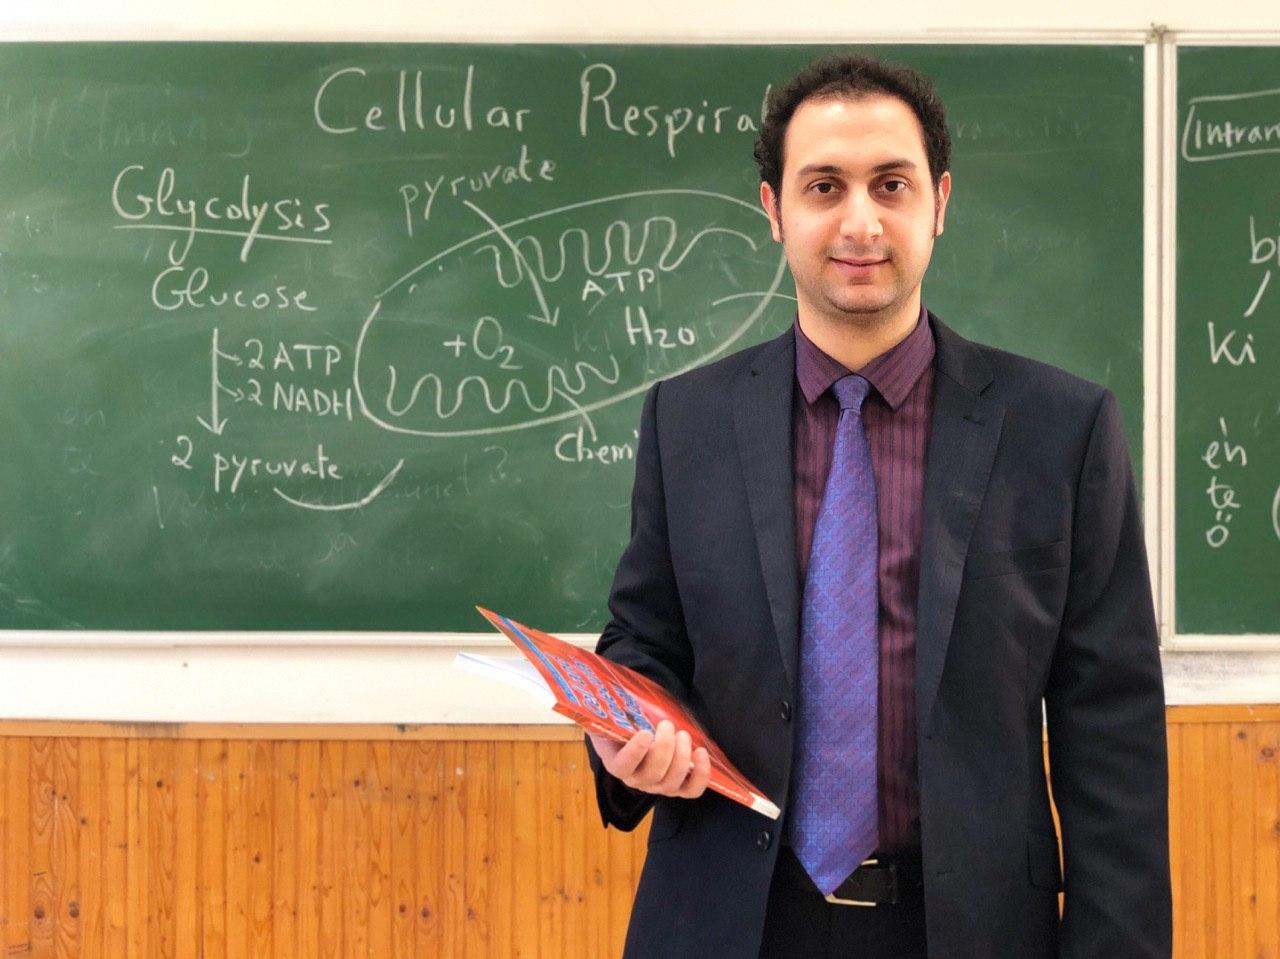 Mr. Harout Parseghian